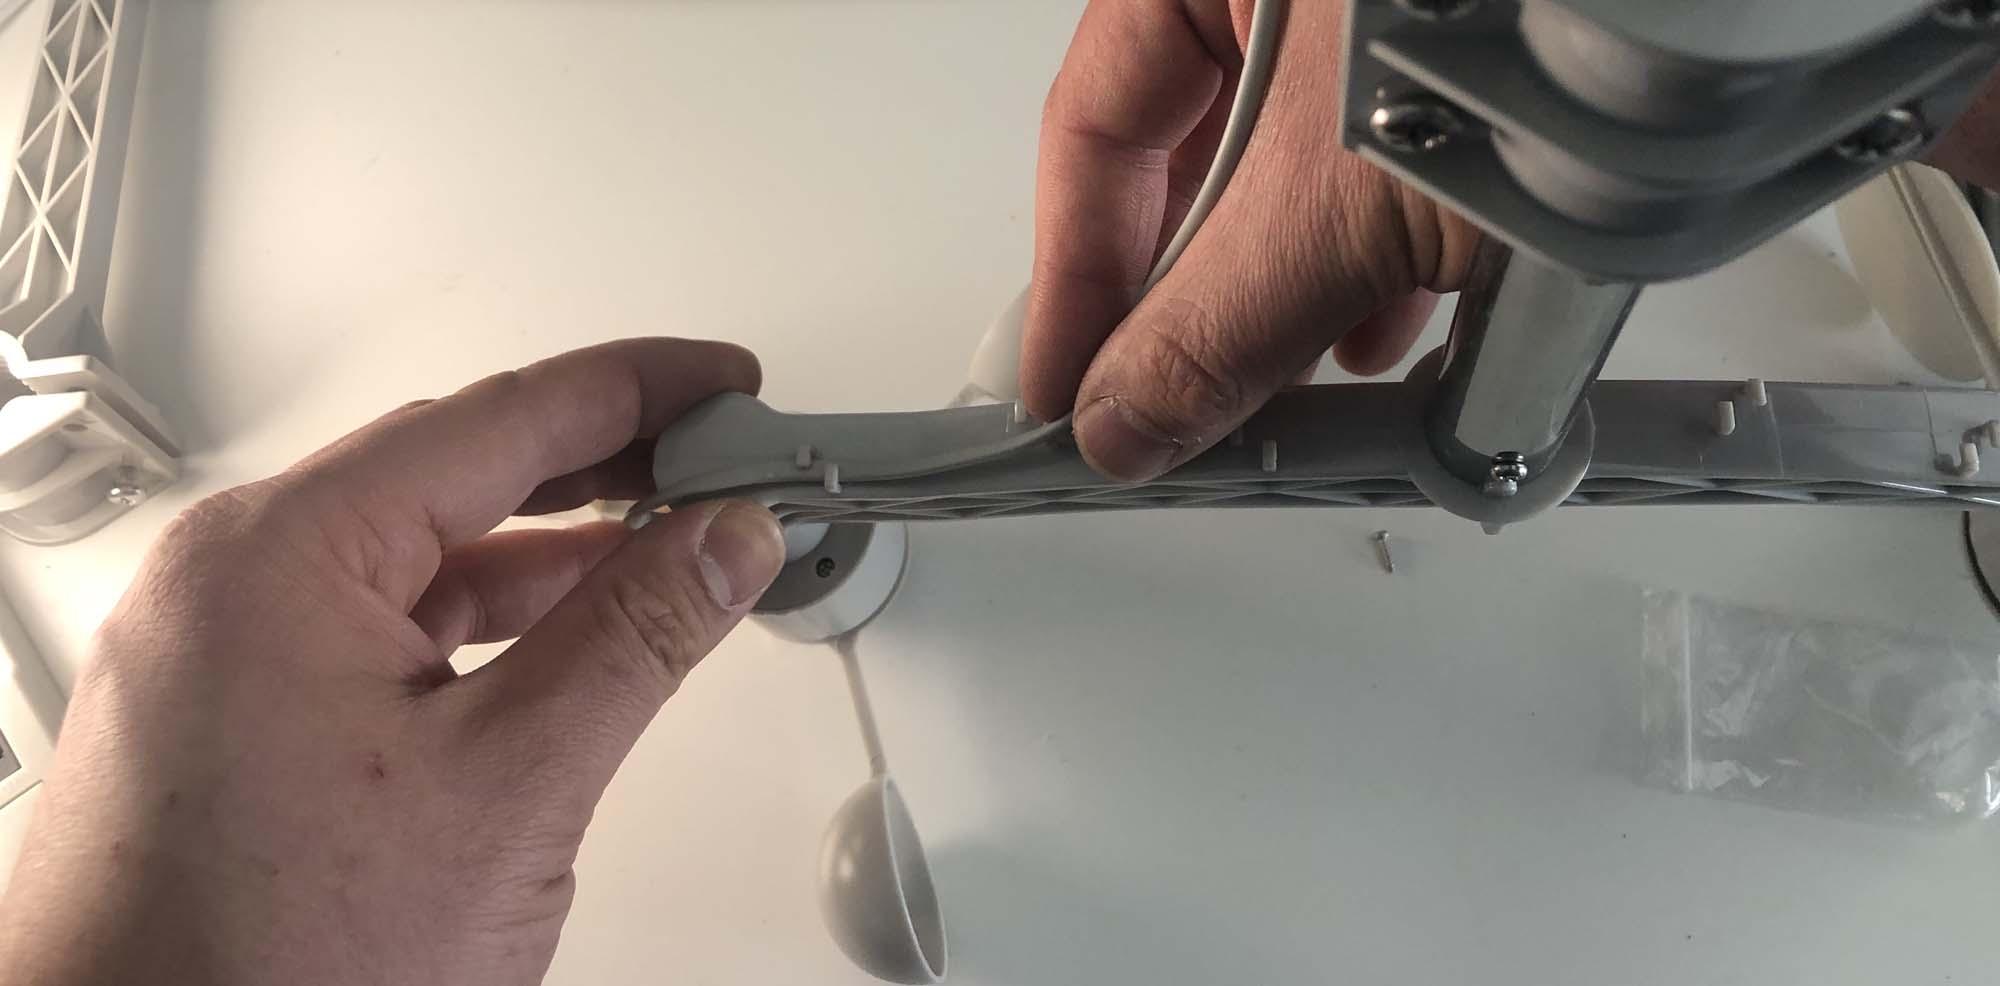 Slide Wires